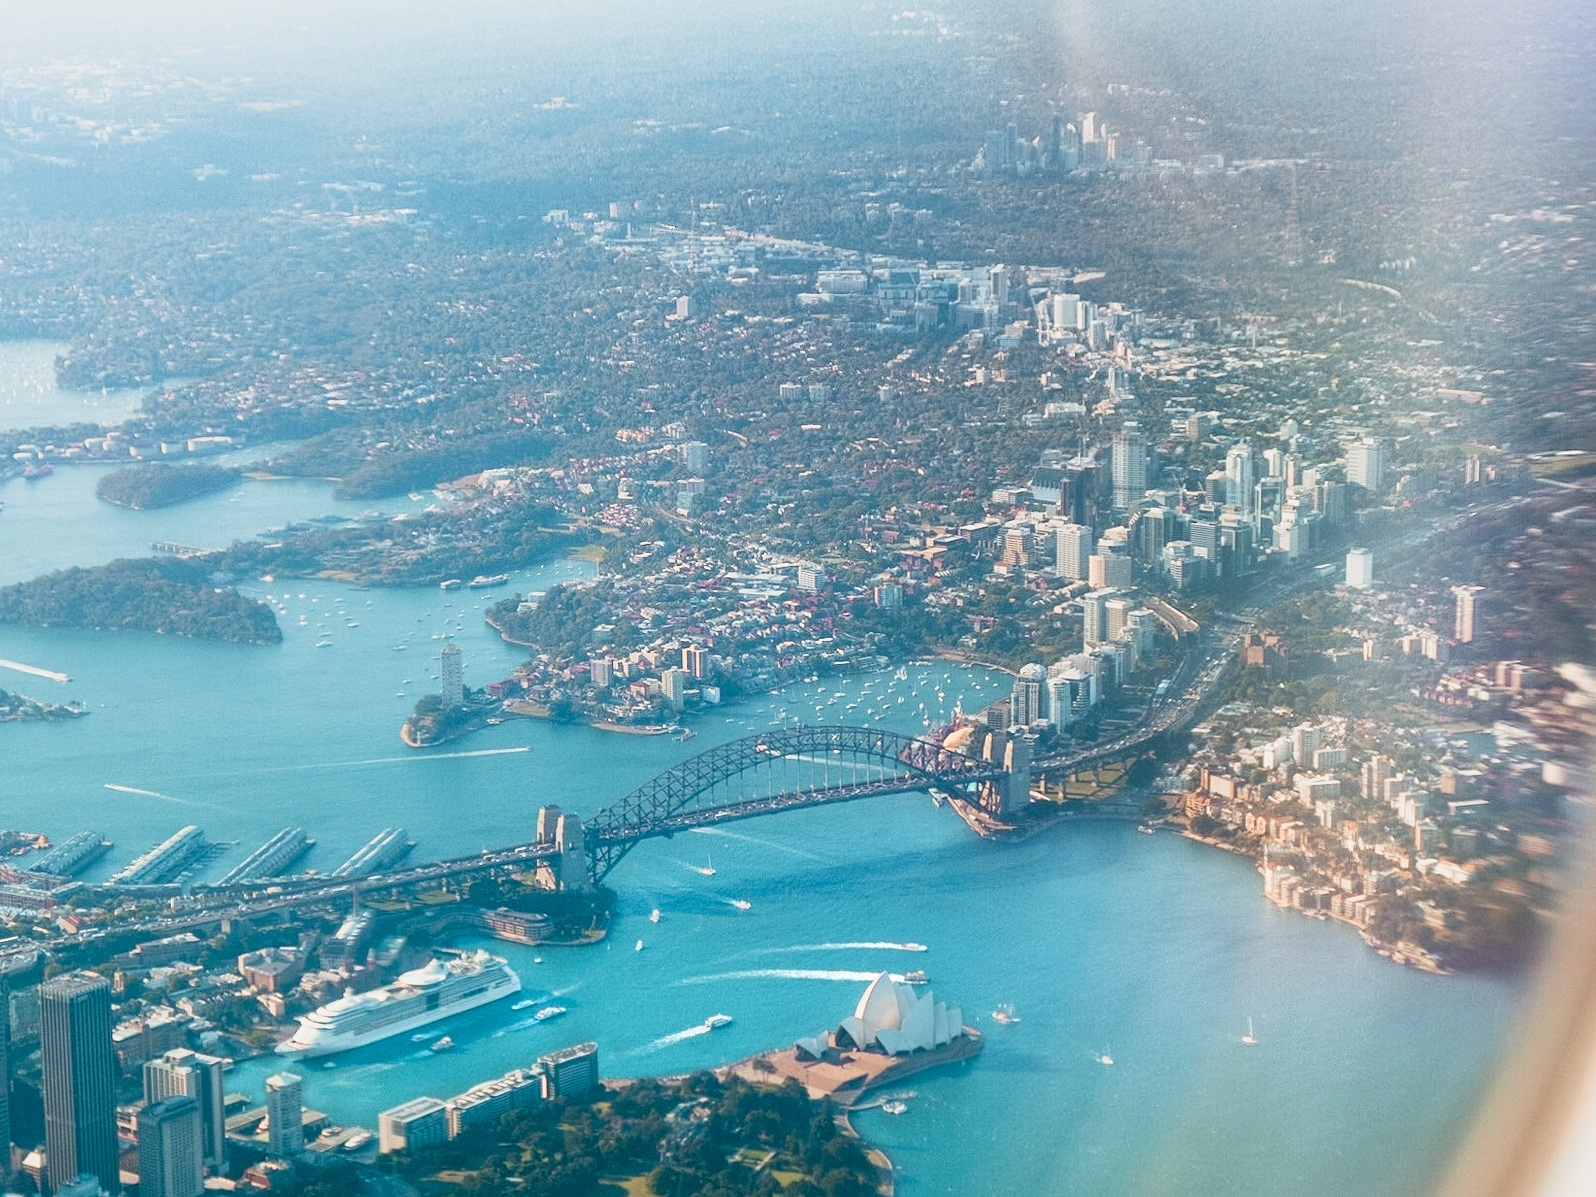 Sydney, Australia, as seen from an airplane window (Photo: Leio McLaren,  Unsplash )